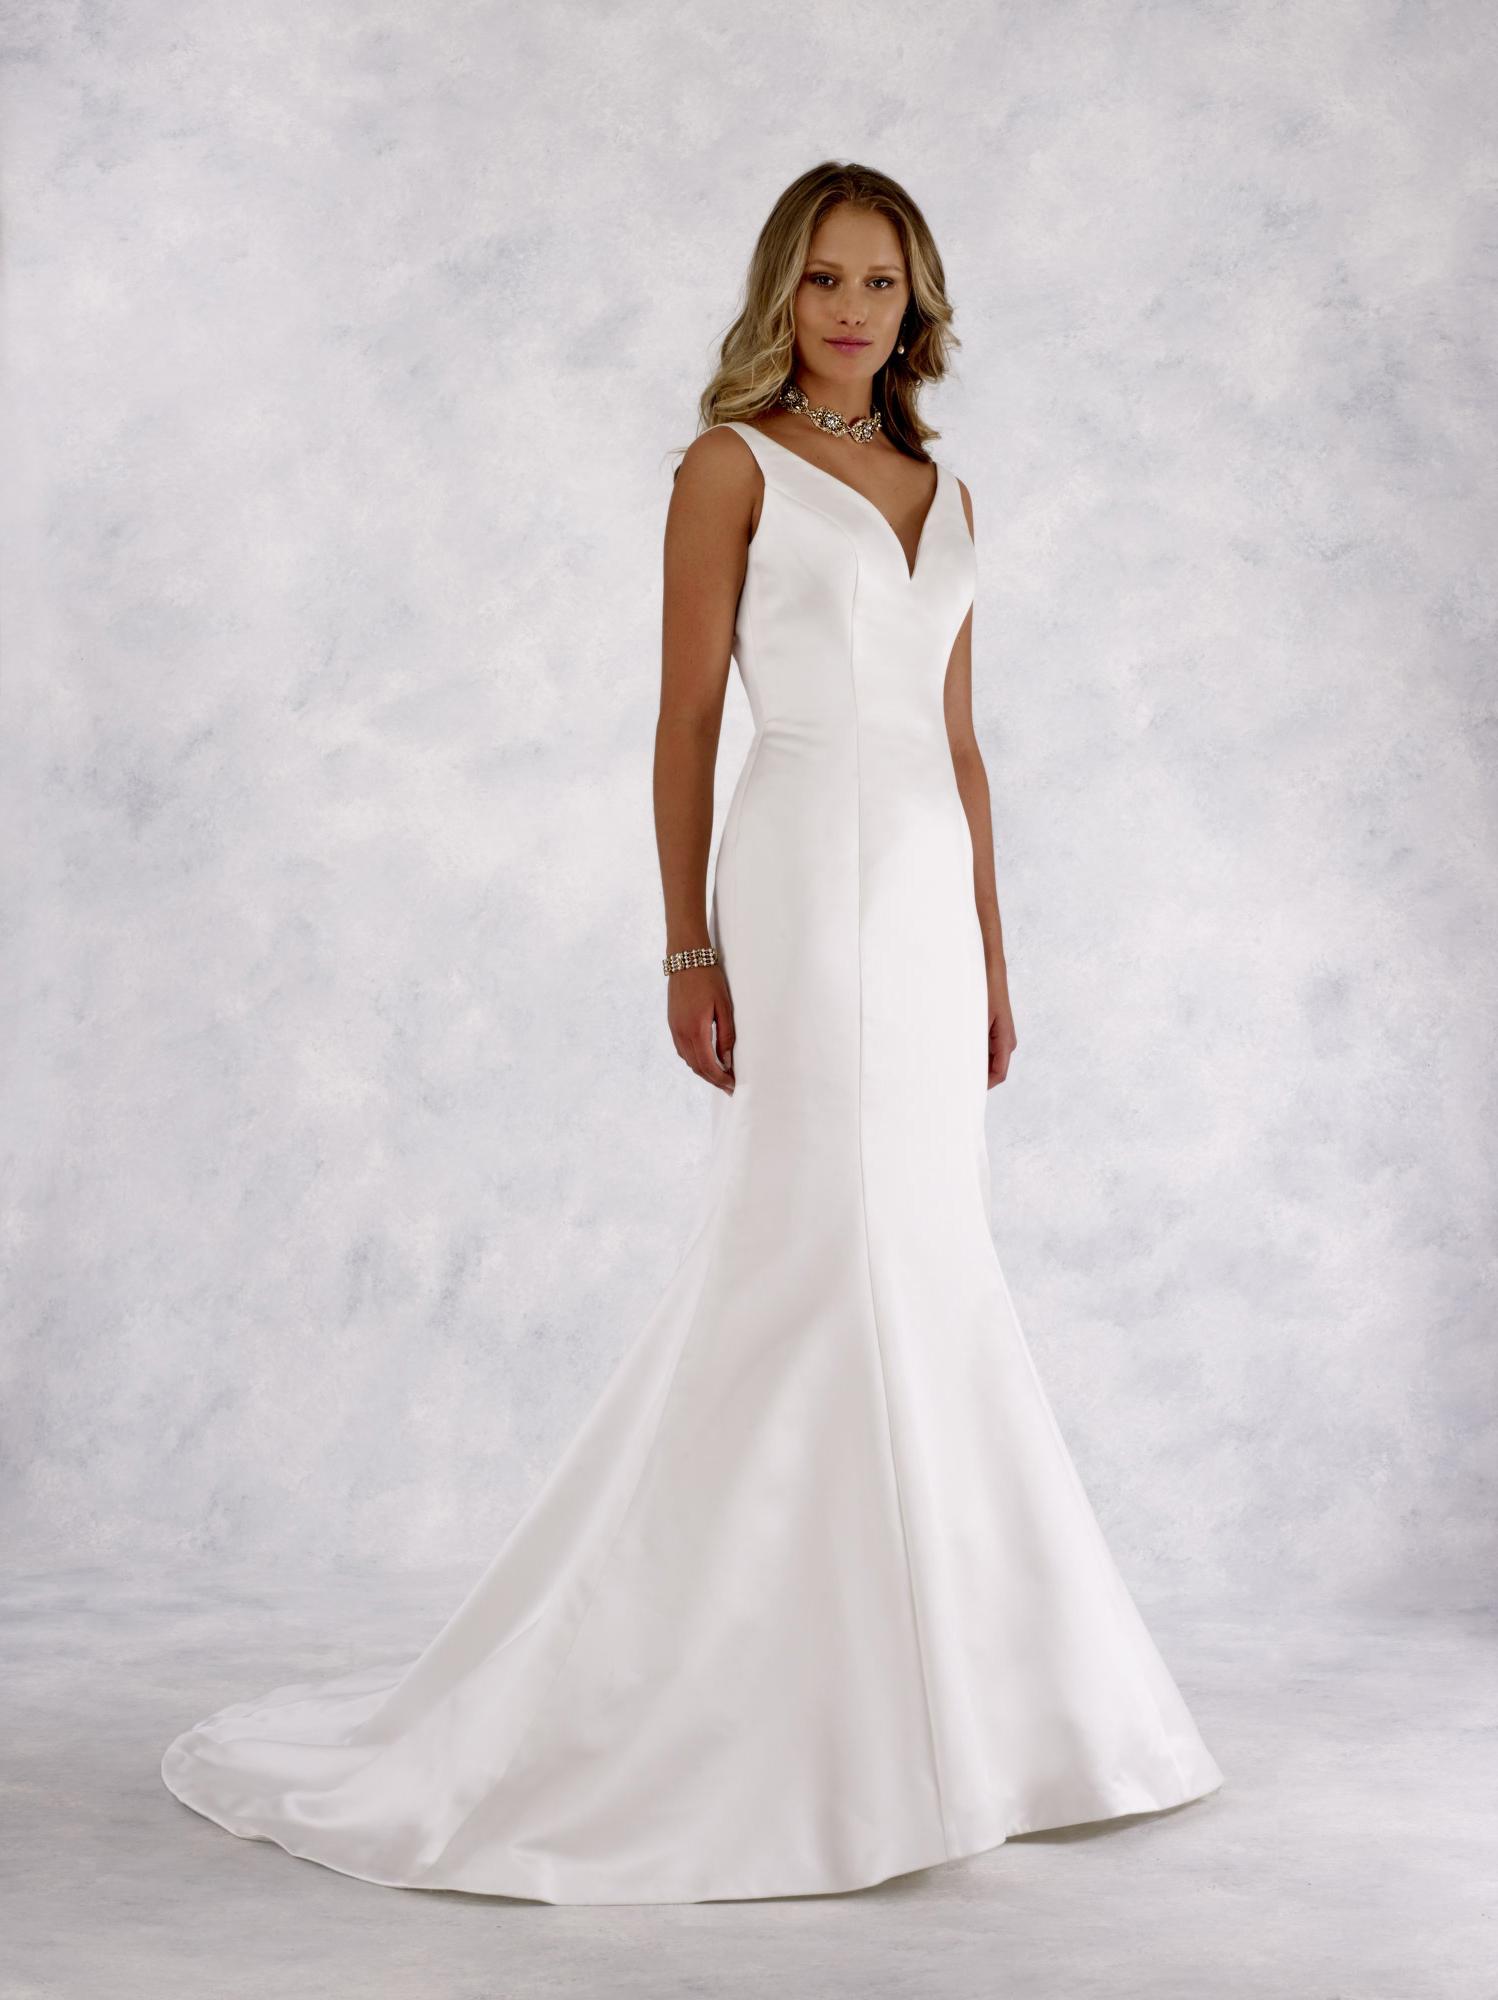 satin mermaid wedding gown